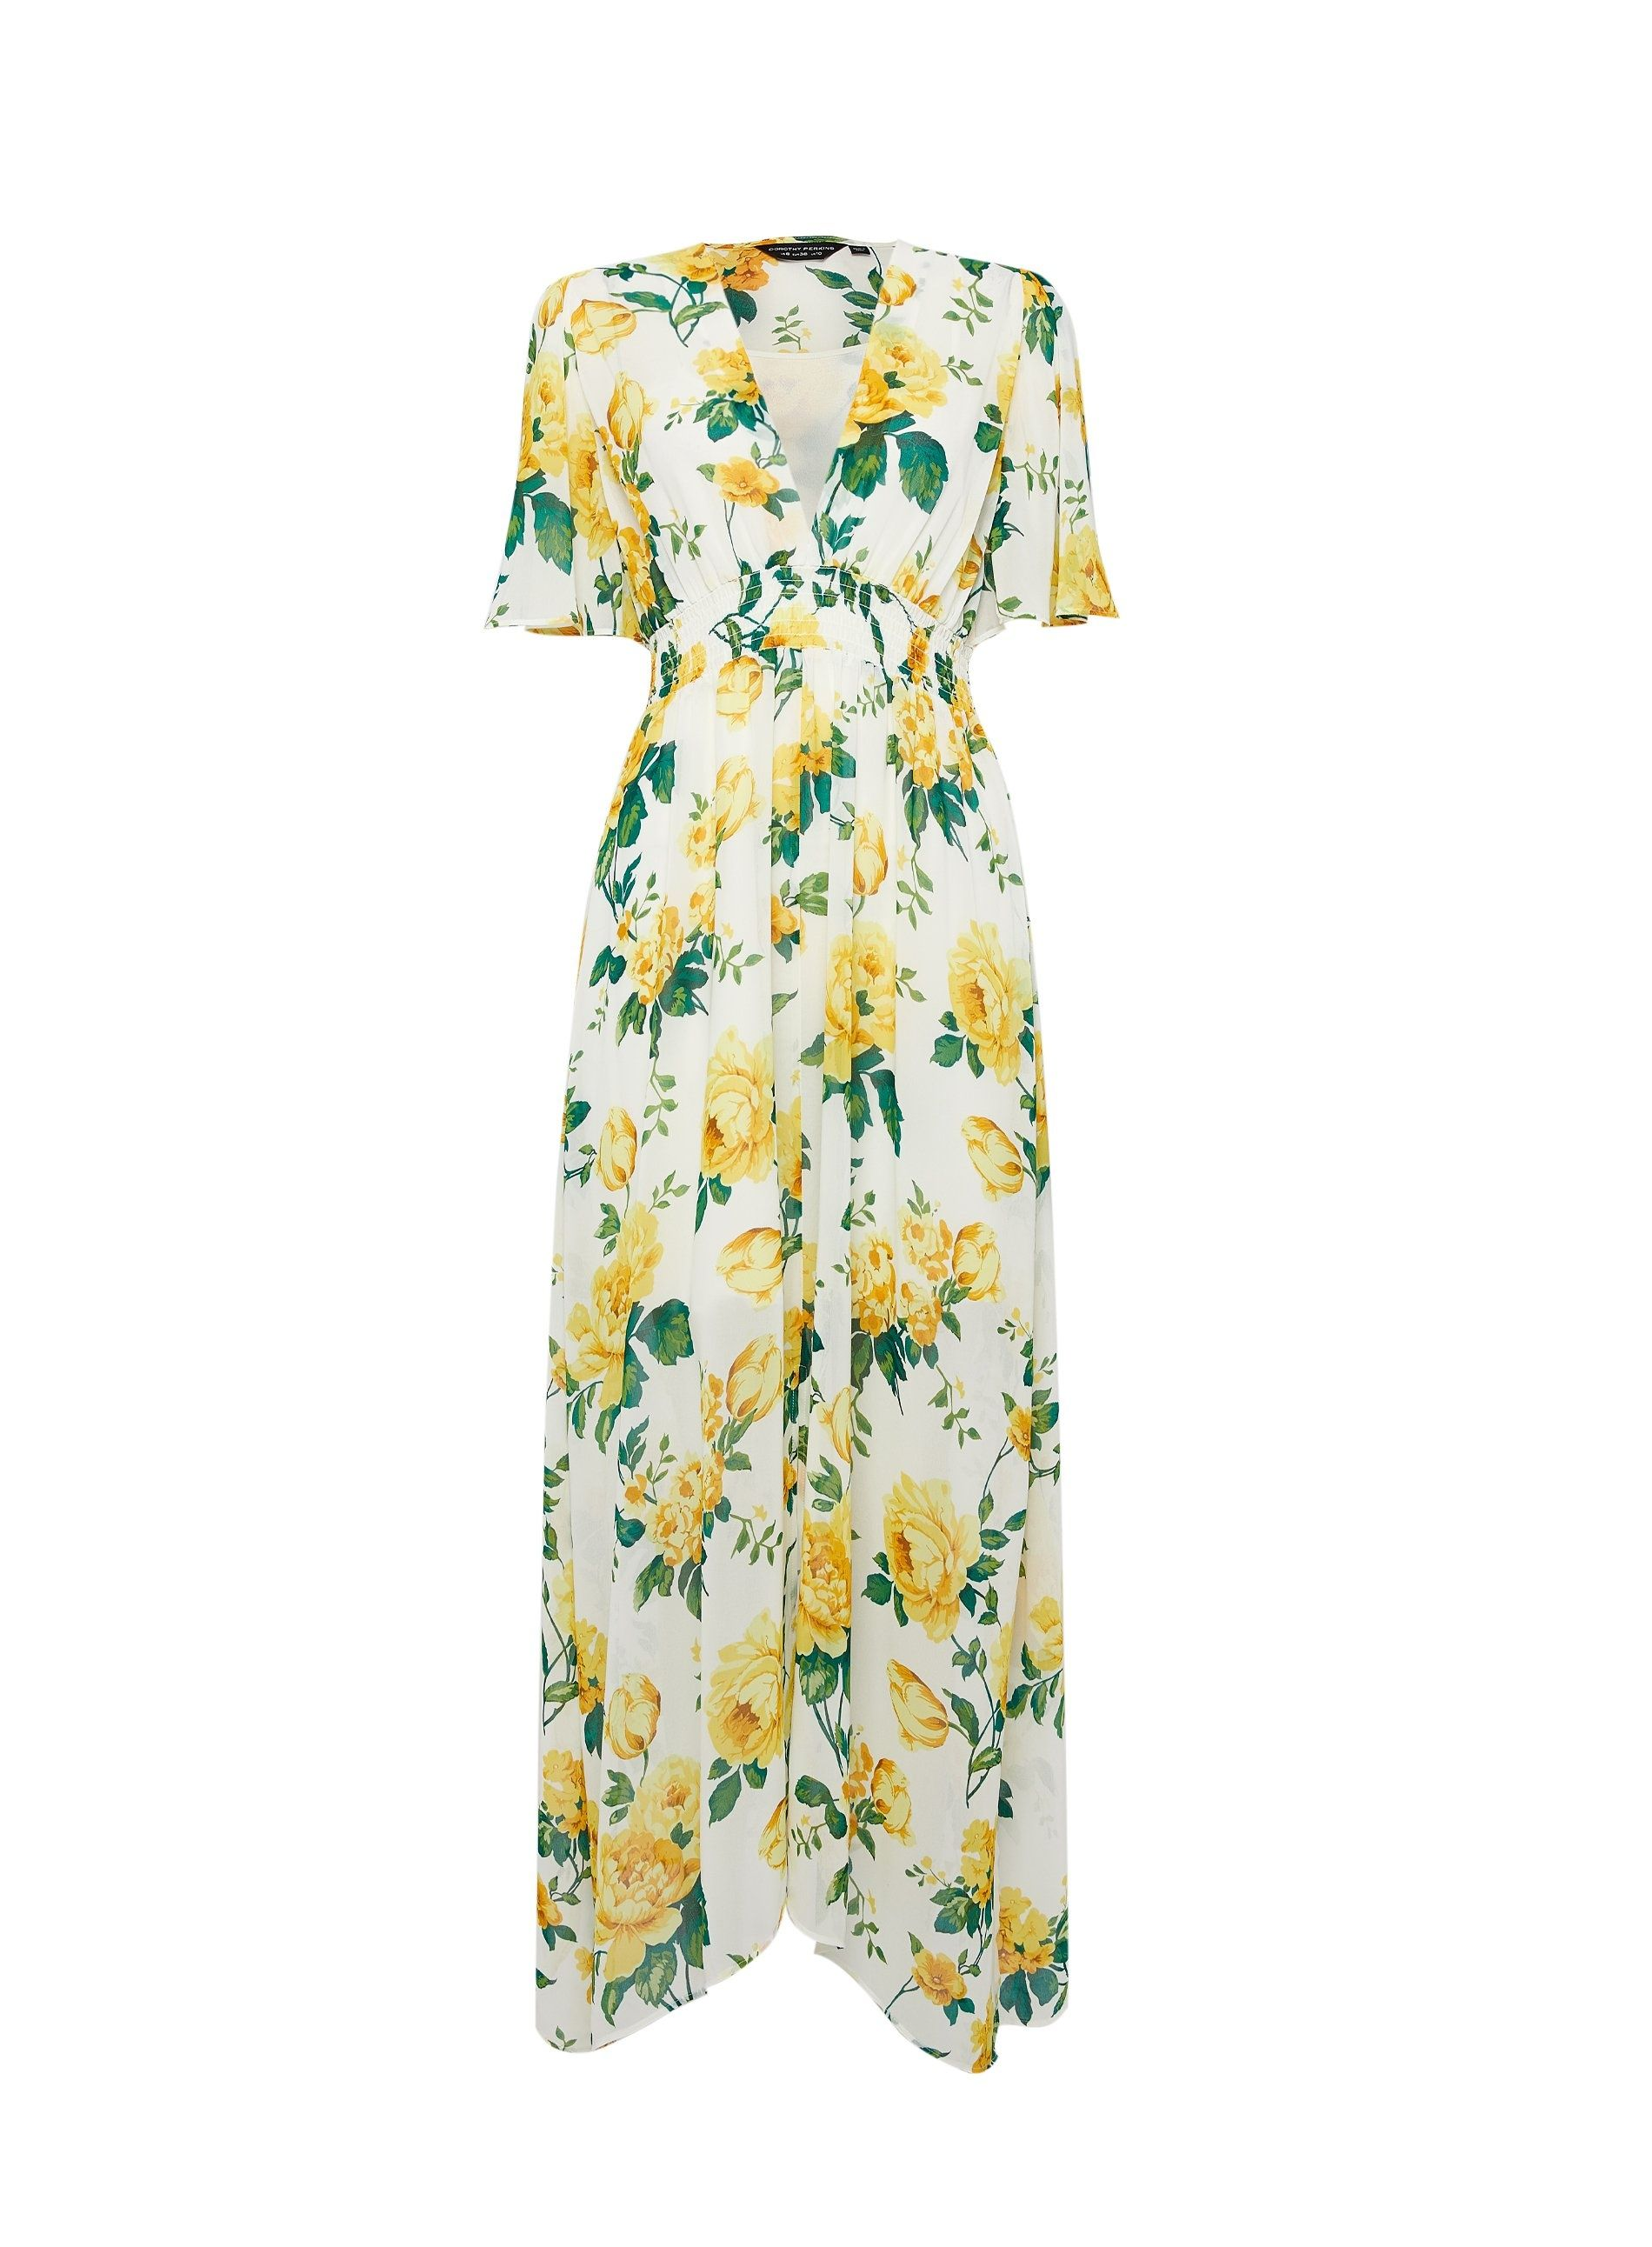 Dorothy Perkins Womens Yellow Floral Print Midi Short Sleeve V Neck Dress